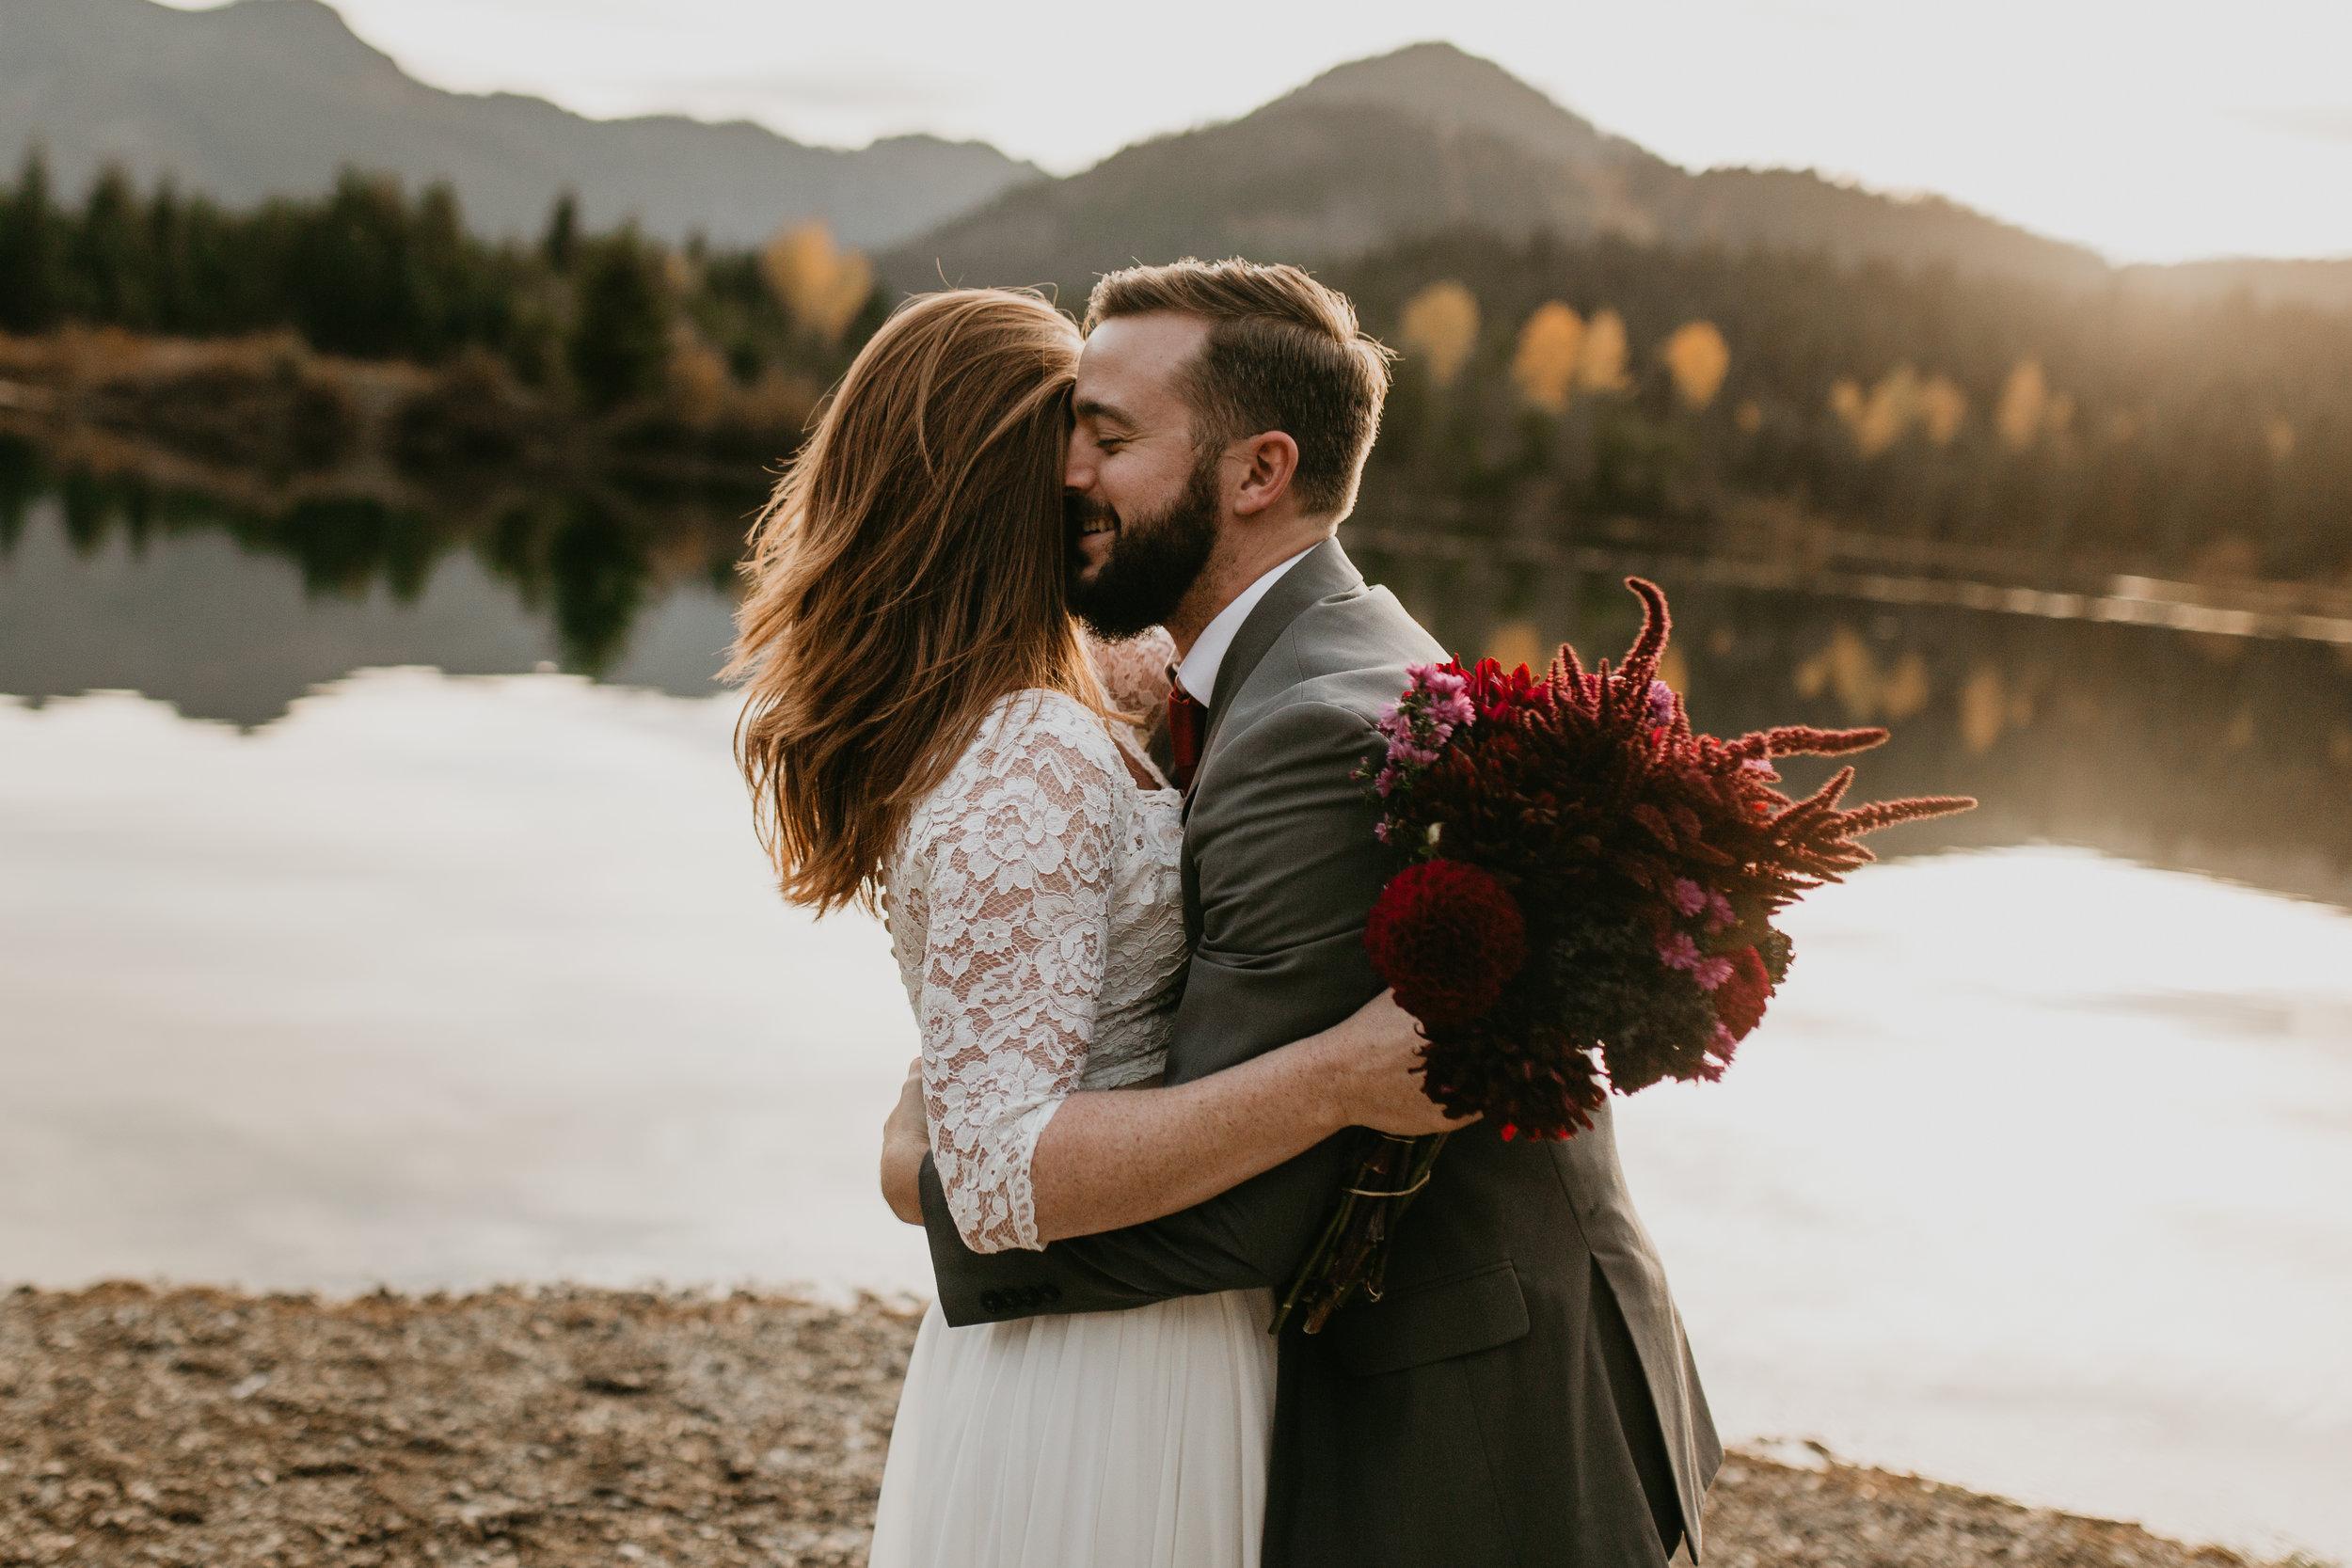 nicole-daacke-photography-mountain-view-elopement-at-gold-creek-pond-snoqualmie-washington-wa-elopement-photographer-photography-adventure-elopement-in-washington-fall-lakeside-golden-sunset-boho-fun-bride-0383.jpg